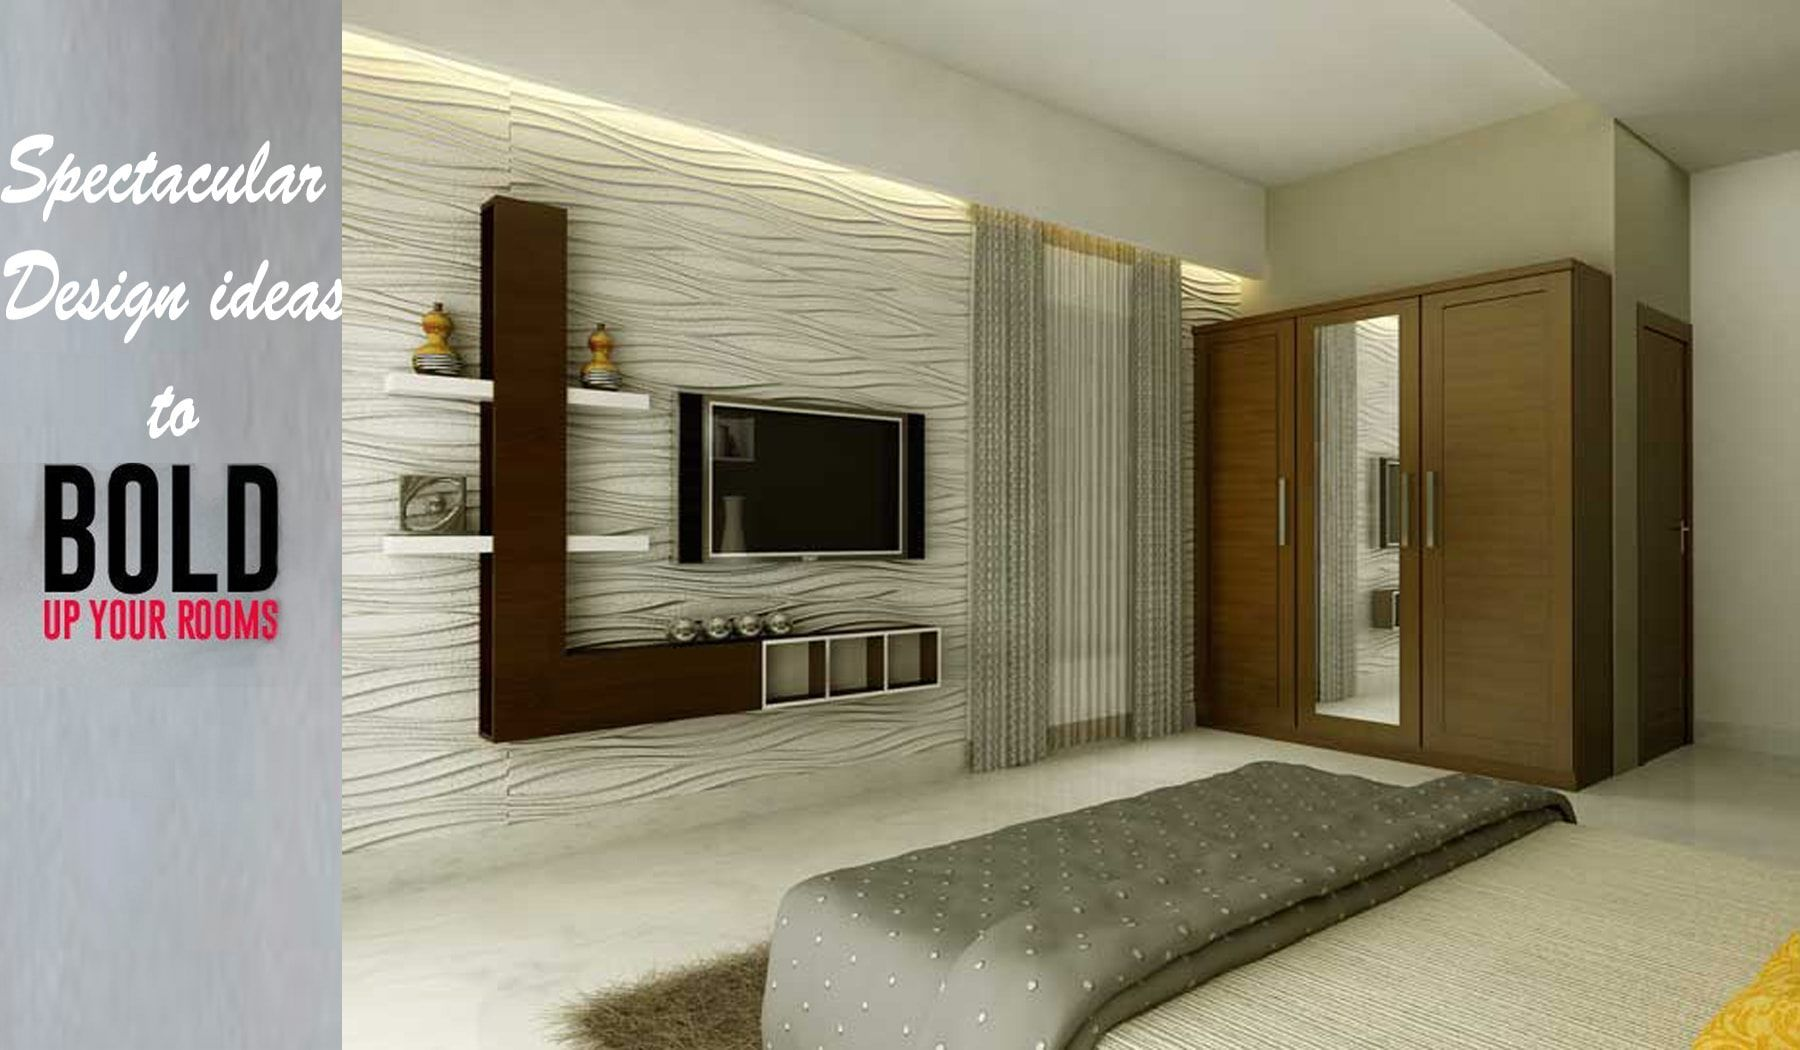 D'life home interiors kochi kerala home interior design companies in chennai  chennai interior design